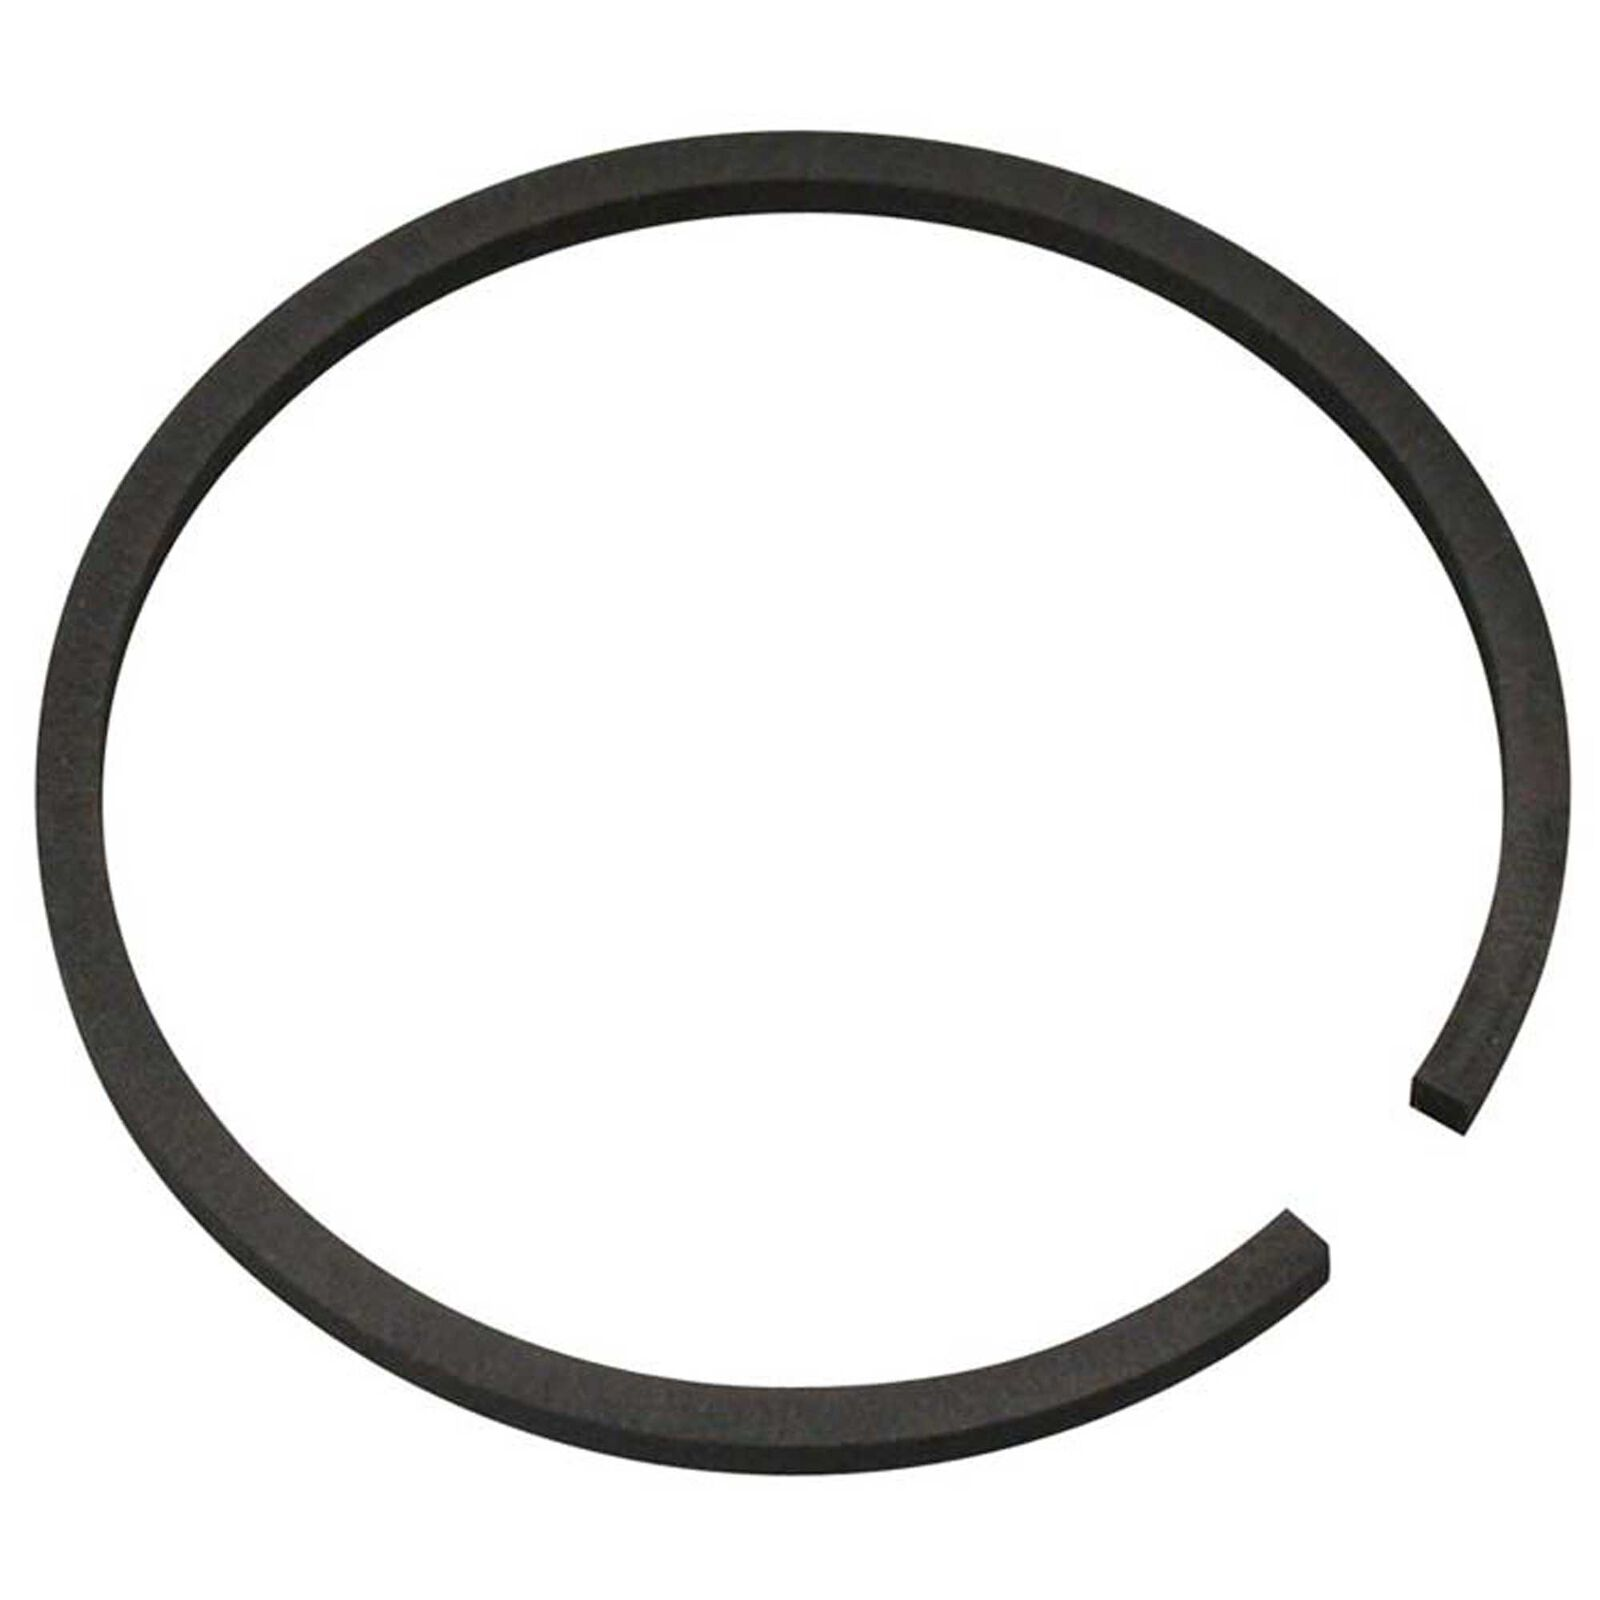 Piston Ring: FS-61